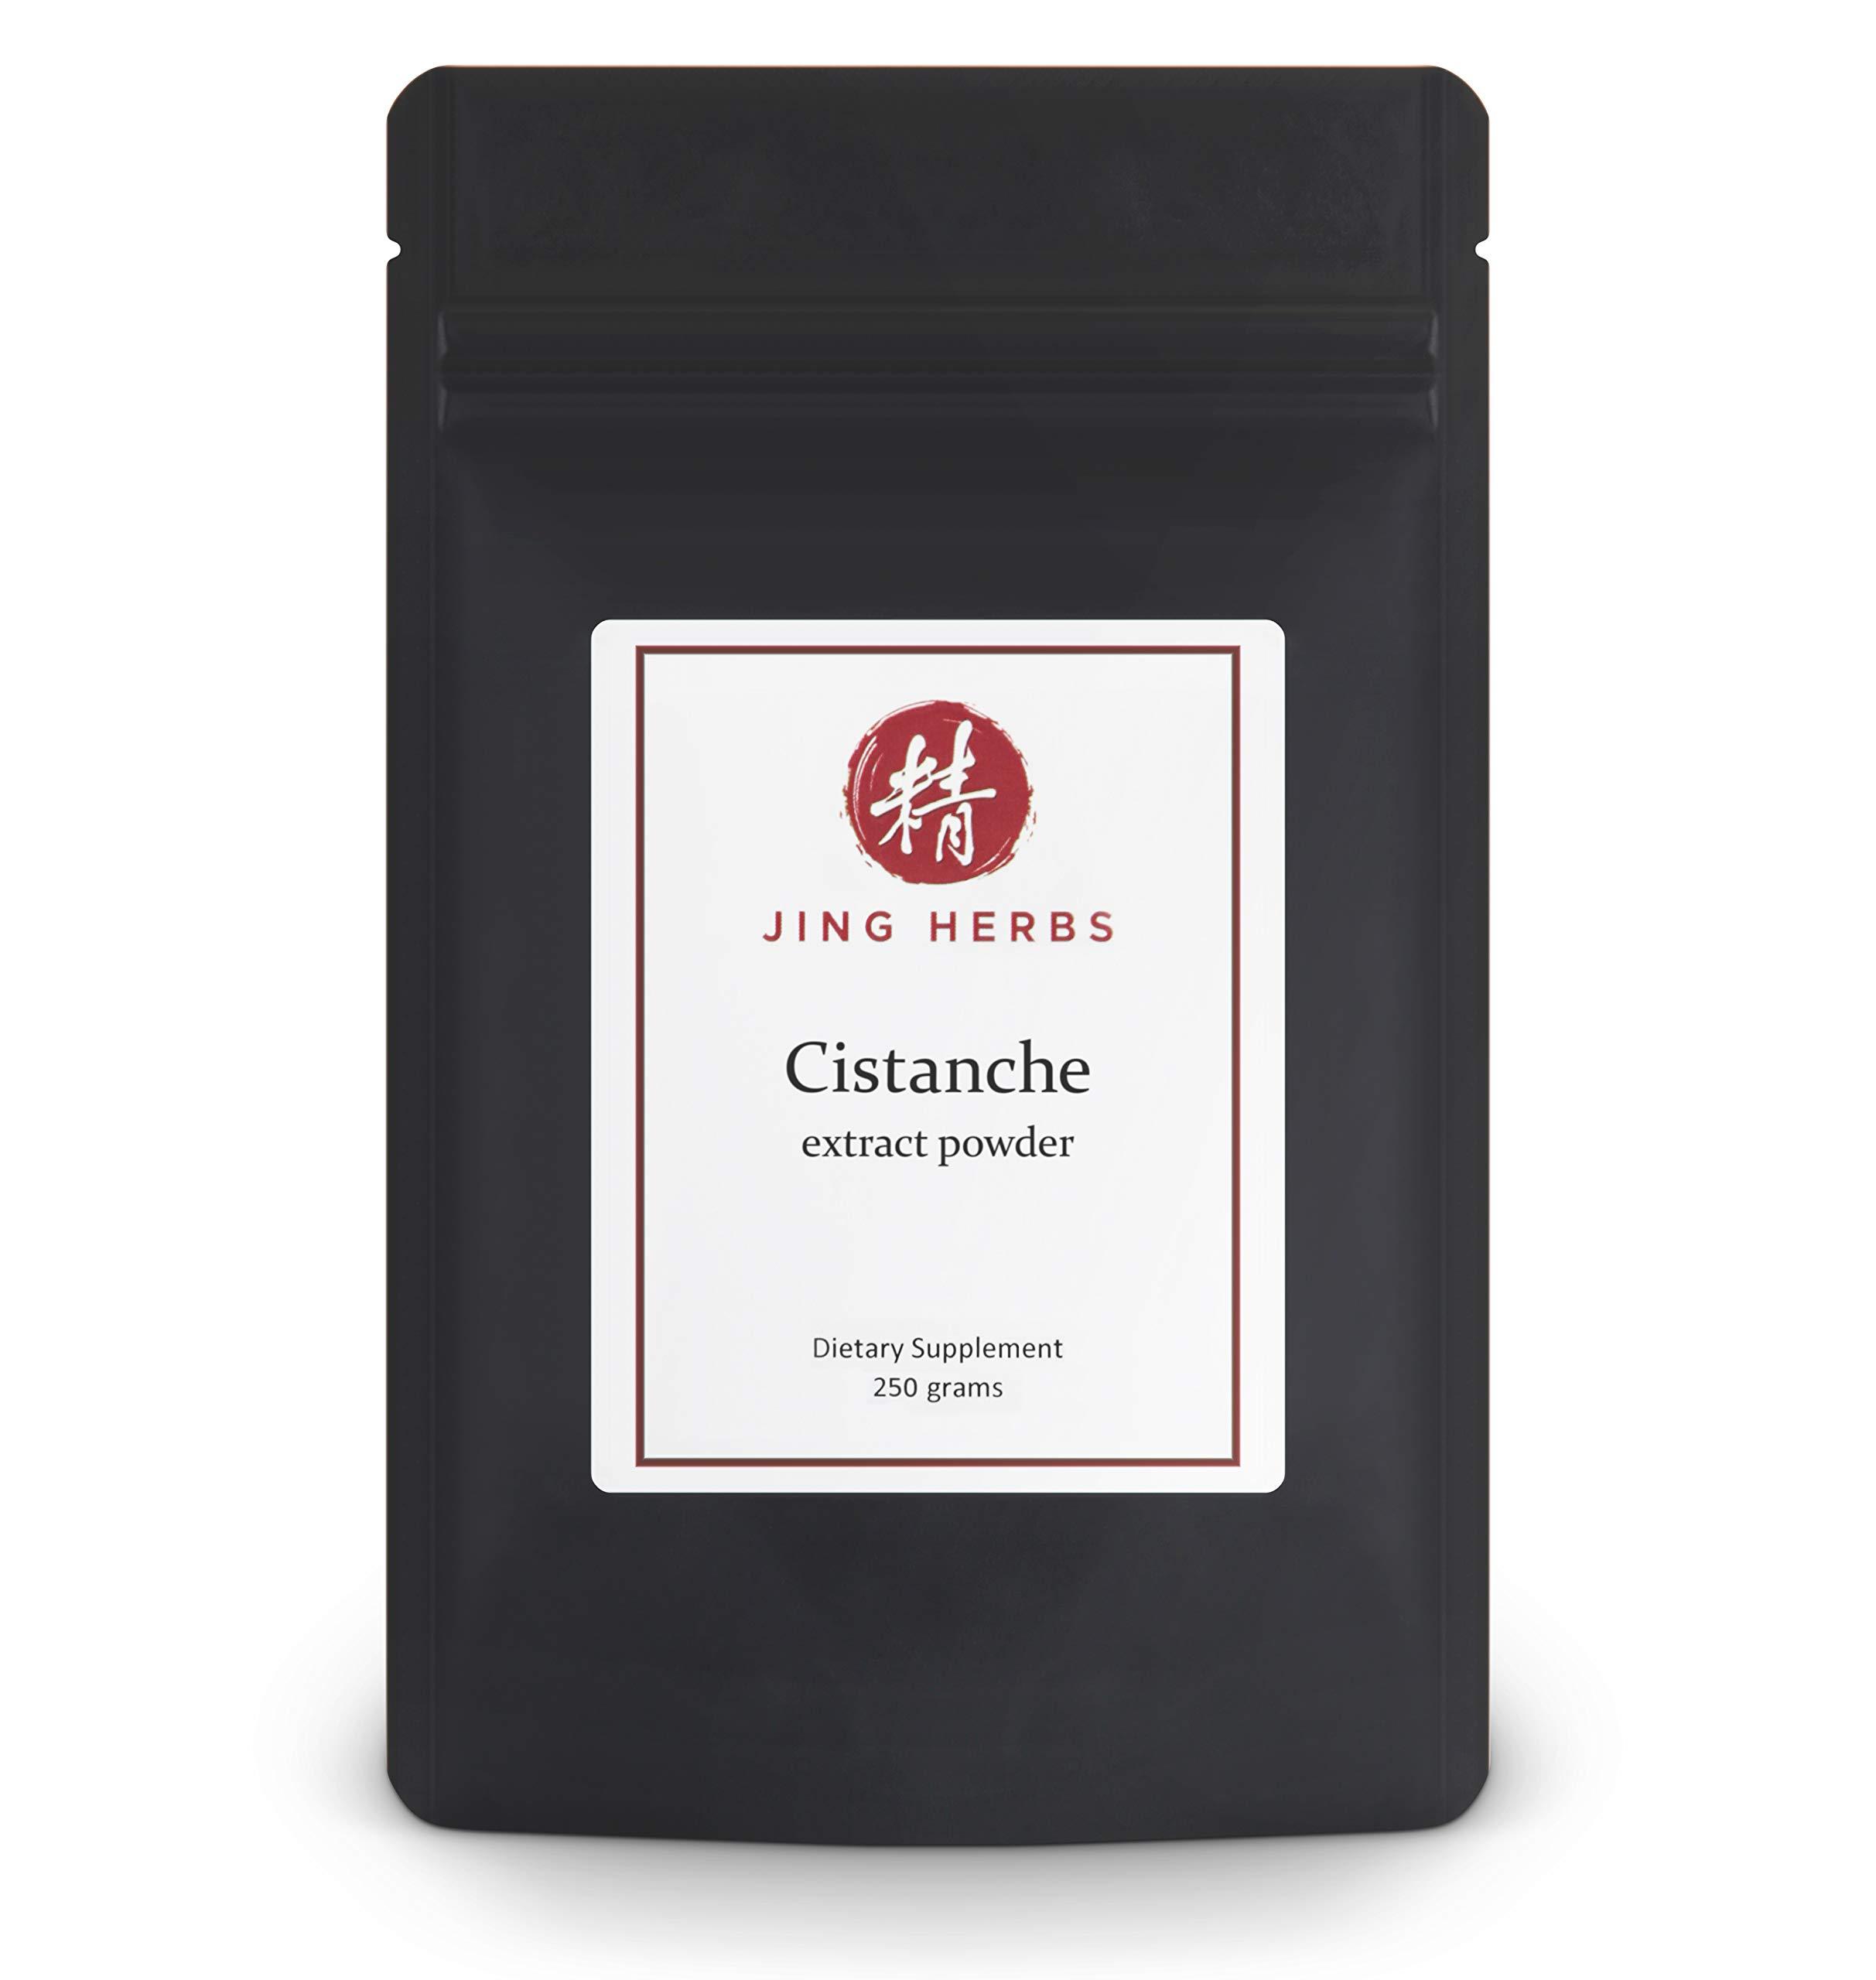 Jing Herbs Cistanche Extract Bulk Powder 250 Grams